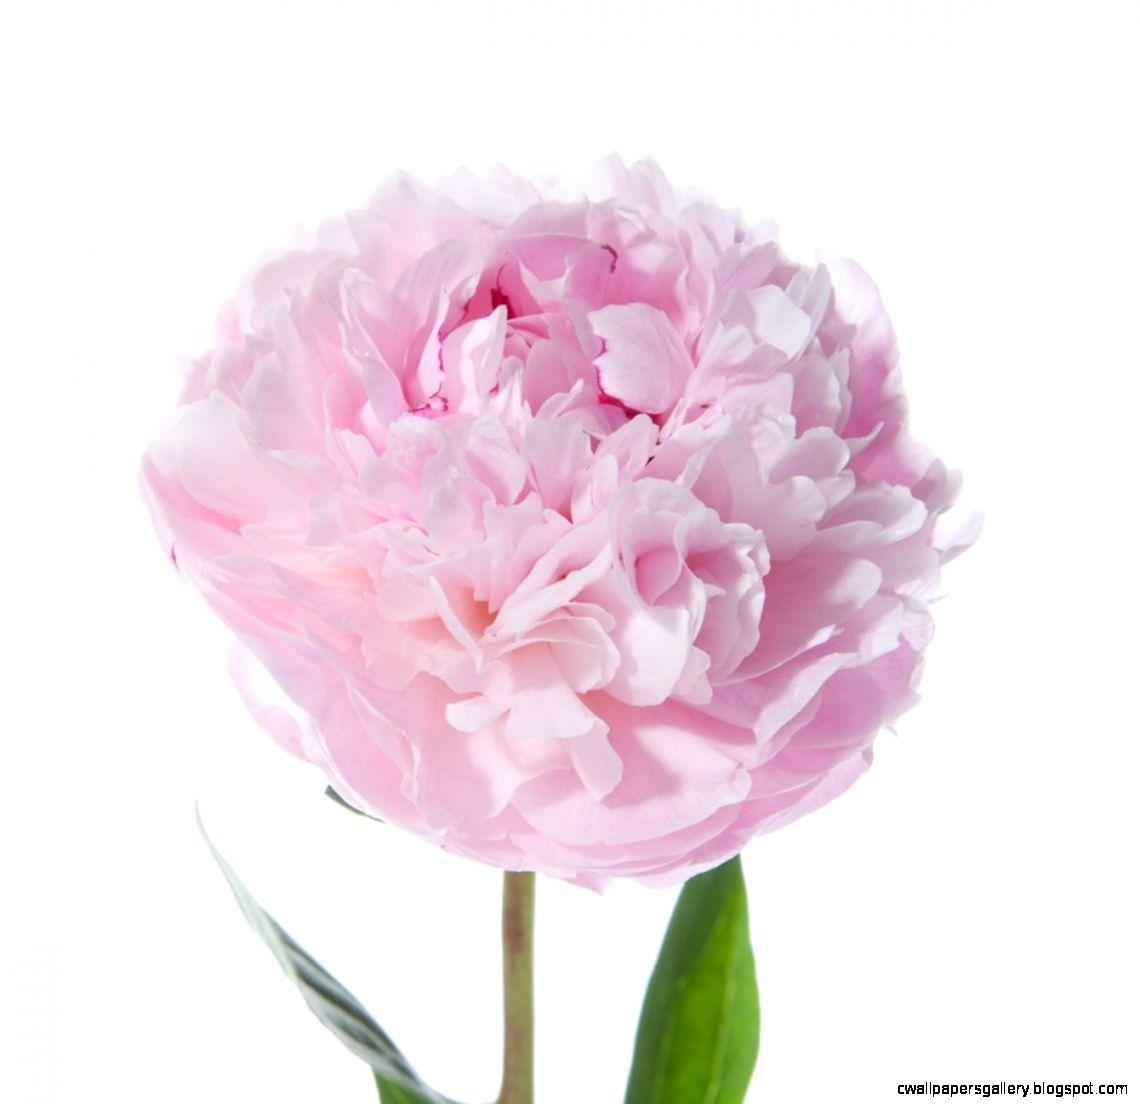 Light Pink Peonies   Peonies   Types of Flowers  Flower Muse